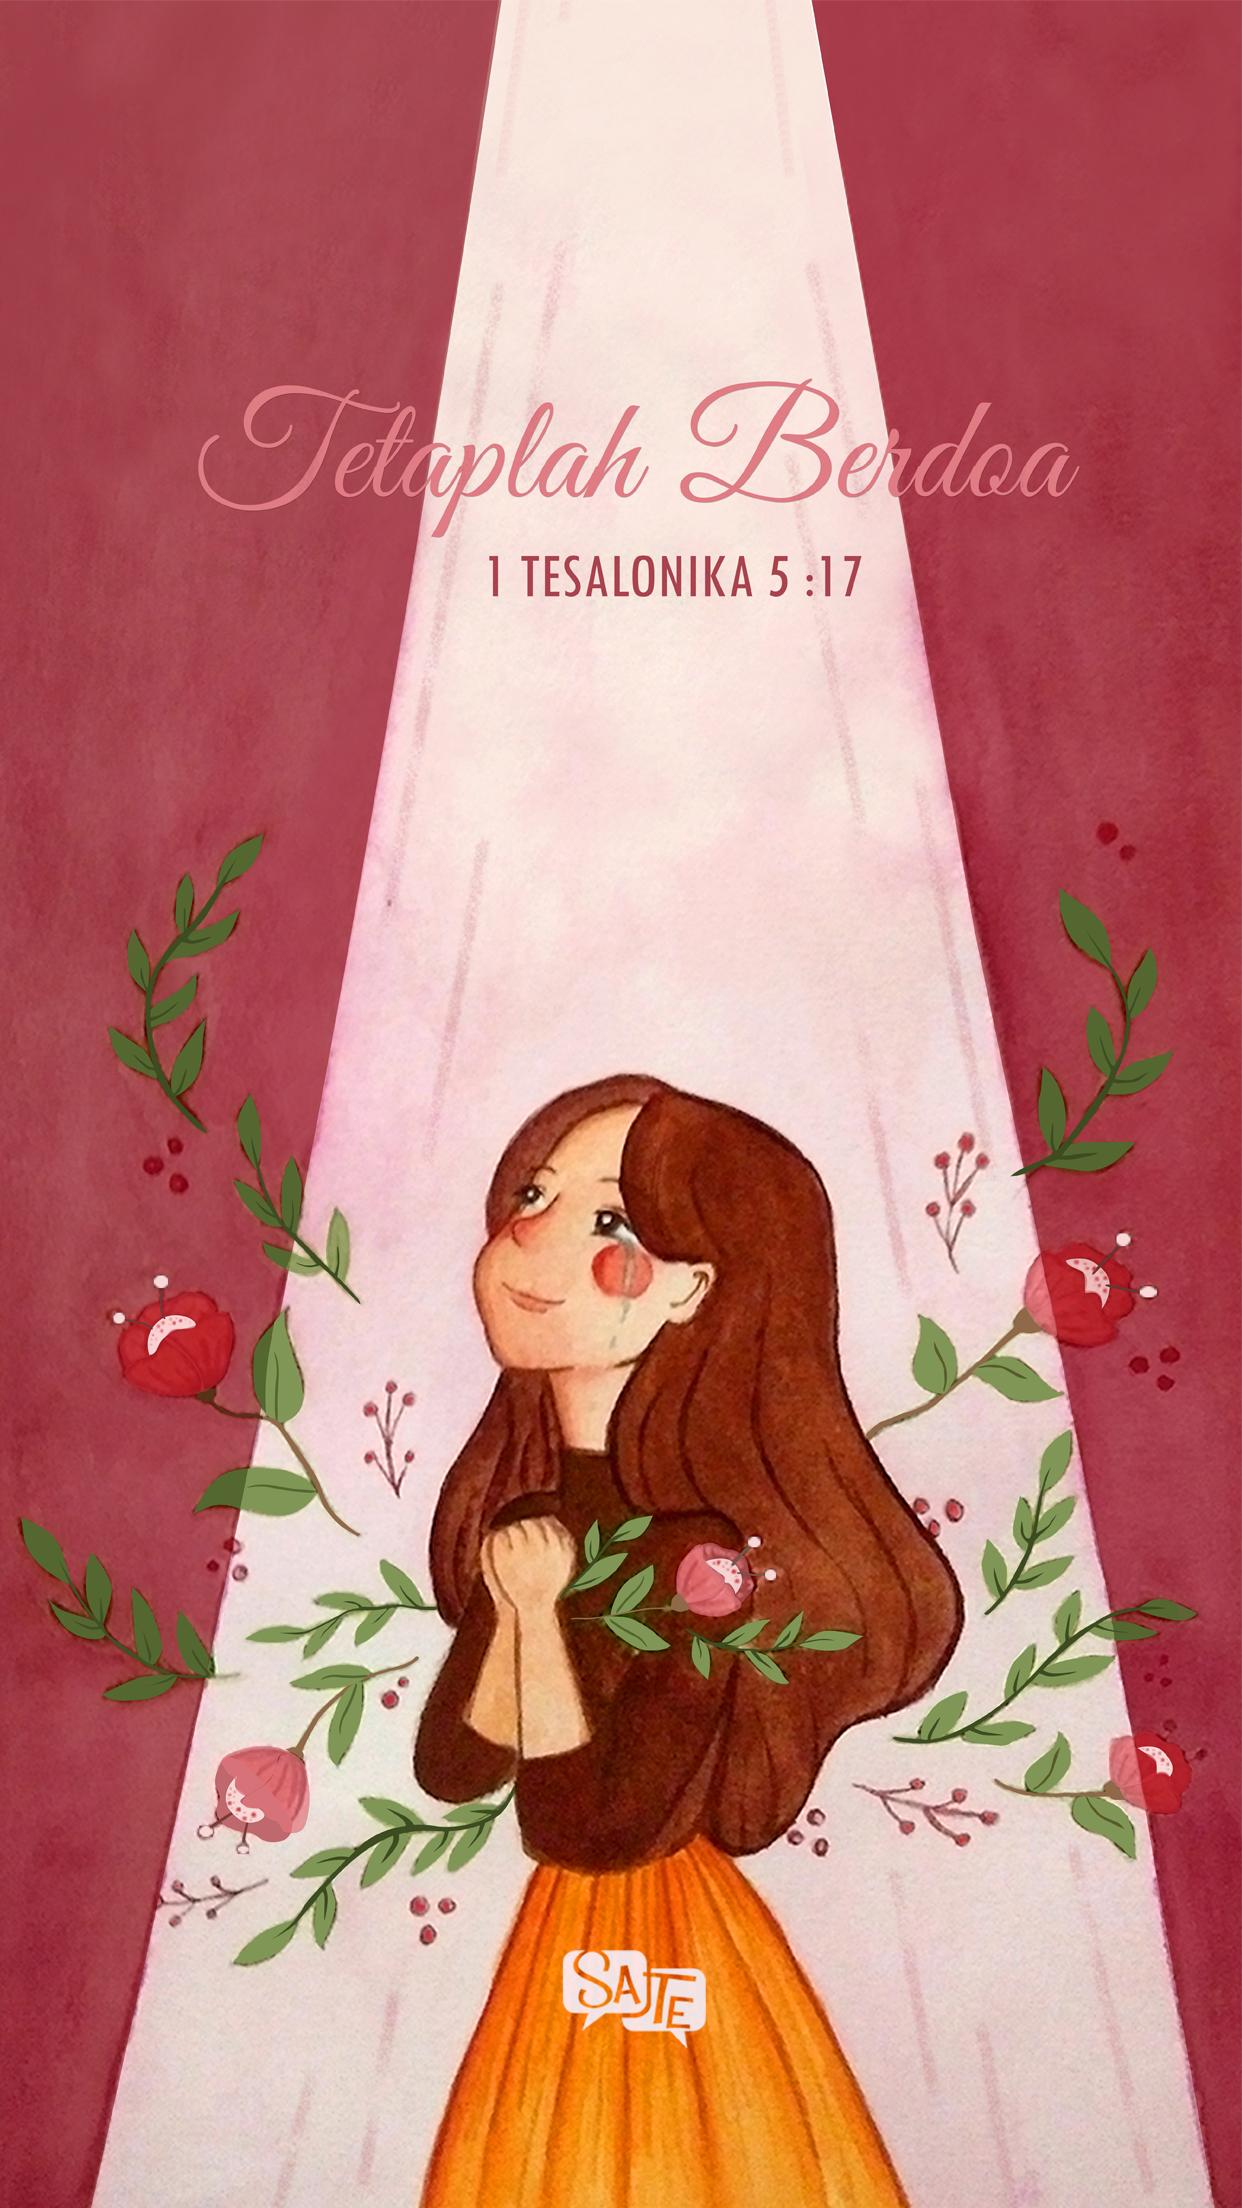 Lock Screen: 1 Tesalonika 5:17